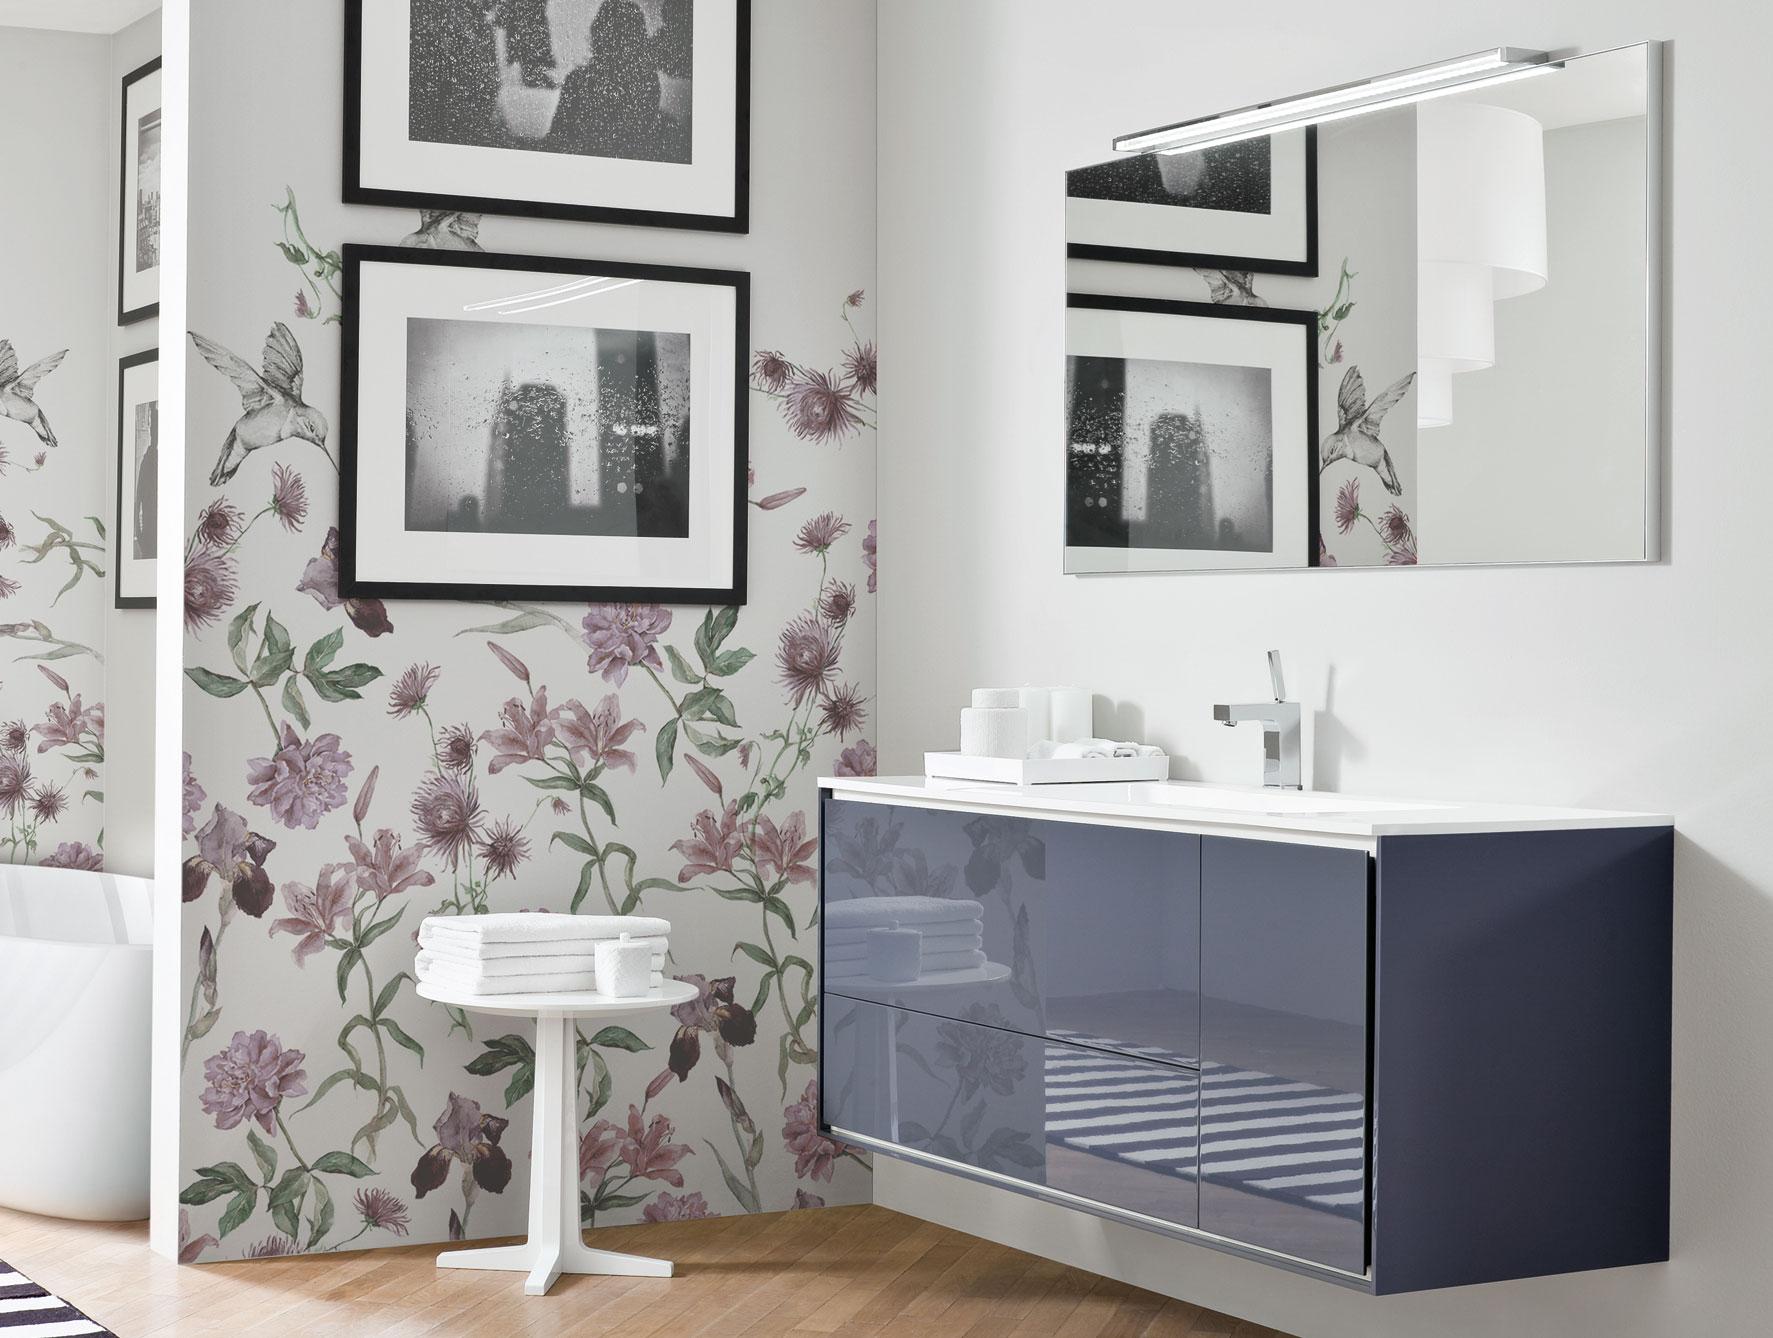 Foshan Furniture Floating Vanity For Small Bathroom Buy Foshan Furniture Vanity For Small Bathroom Bathroom Vanity Product On Alibaba Com